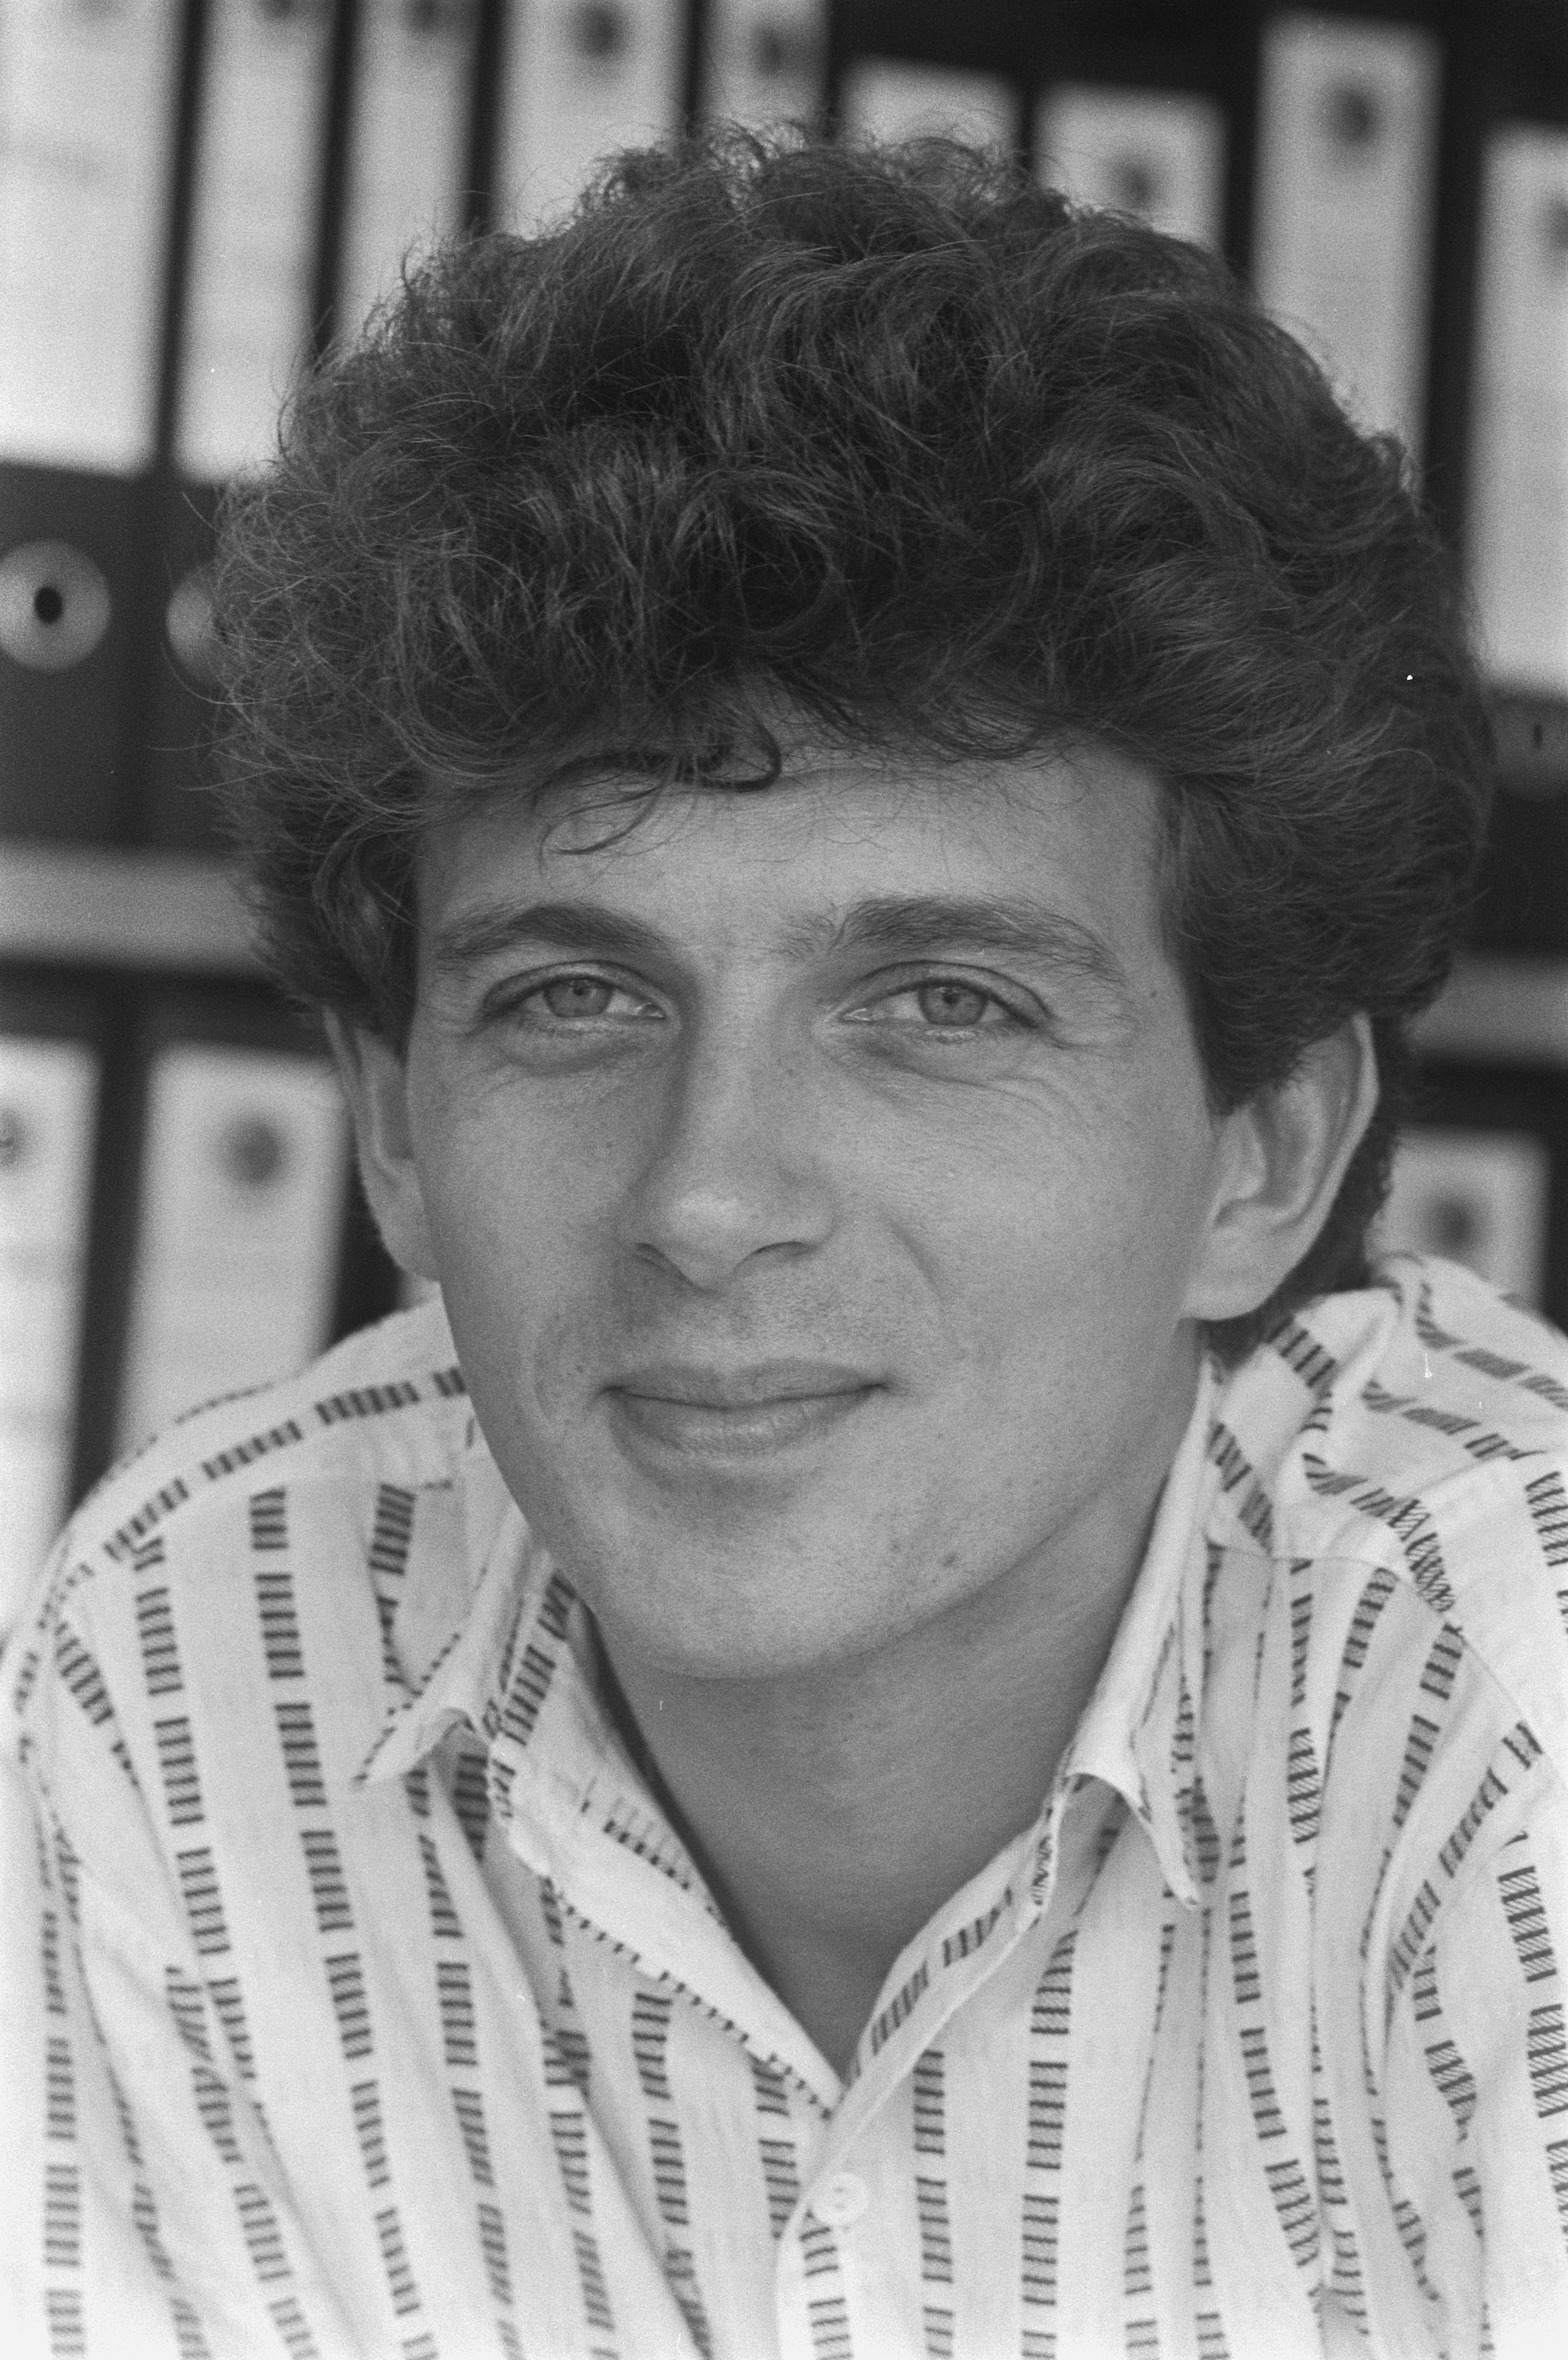 https commons wikimedia org wiki file naast leonie jansen nu ook robert ten brink als presentator in het jeugdjournaal bestanddeelnr 933 0650 jpg